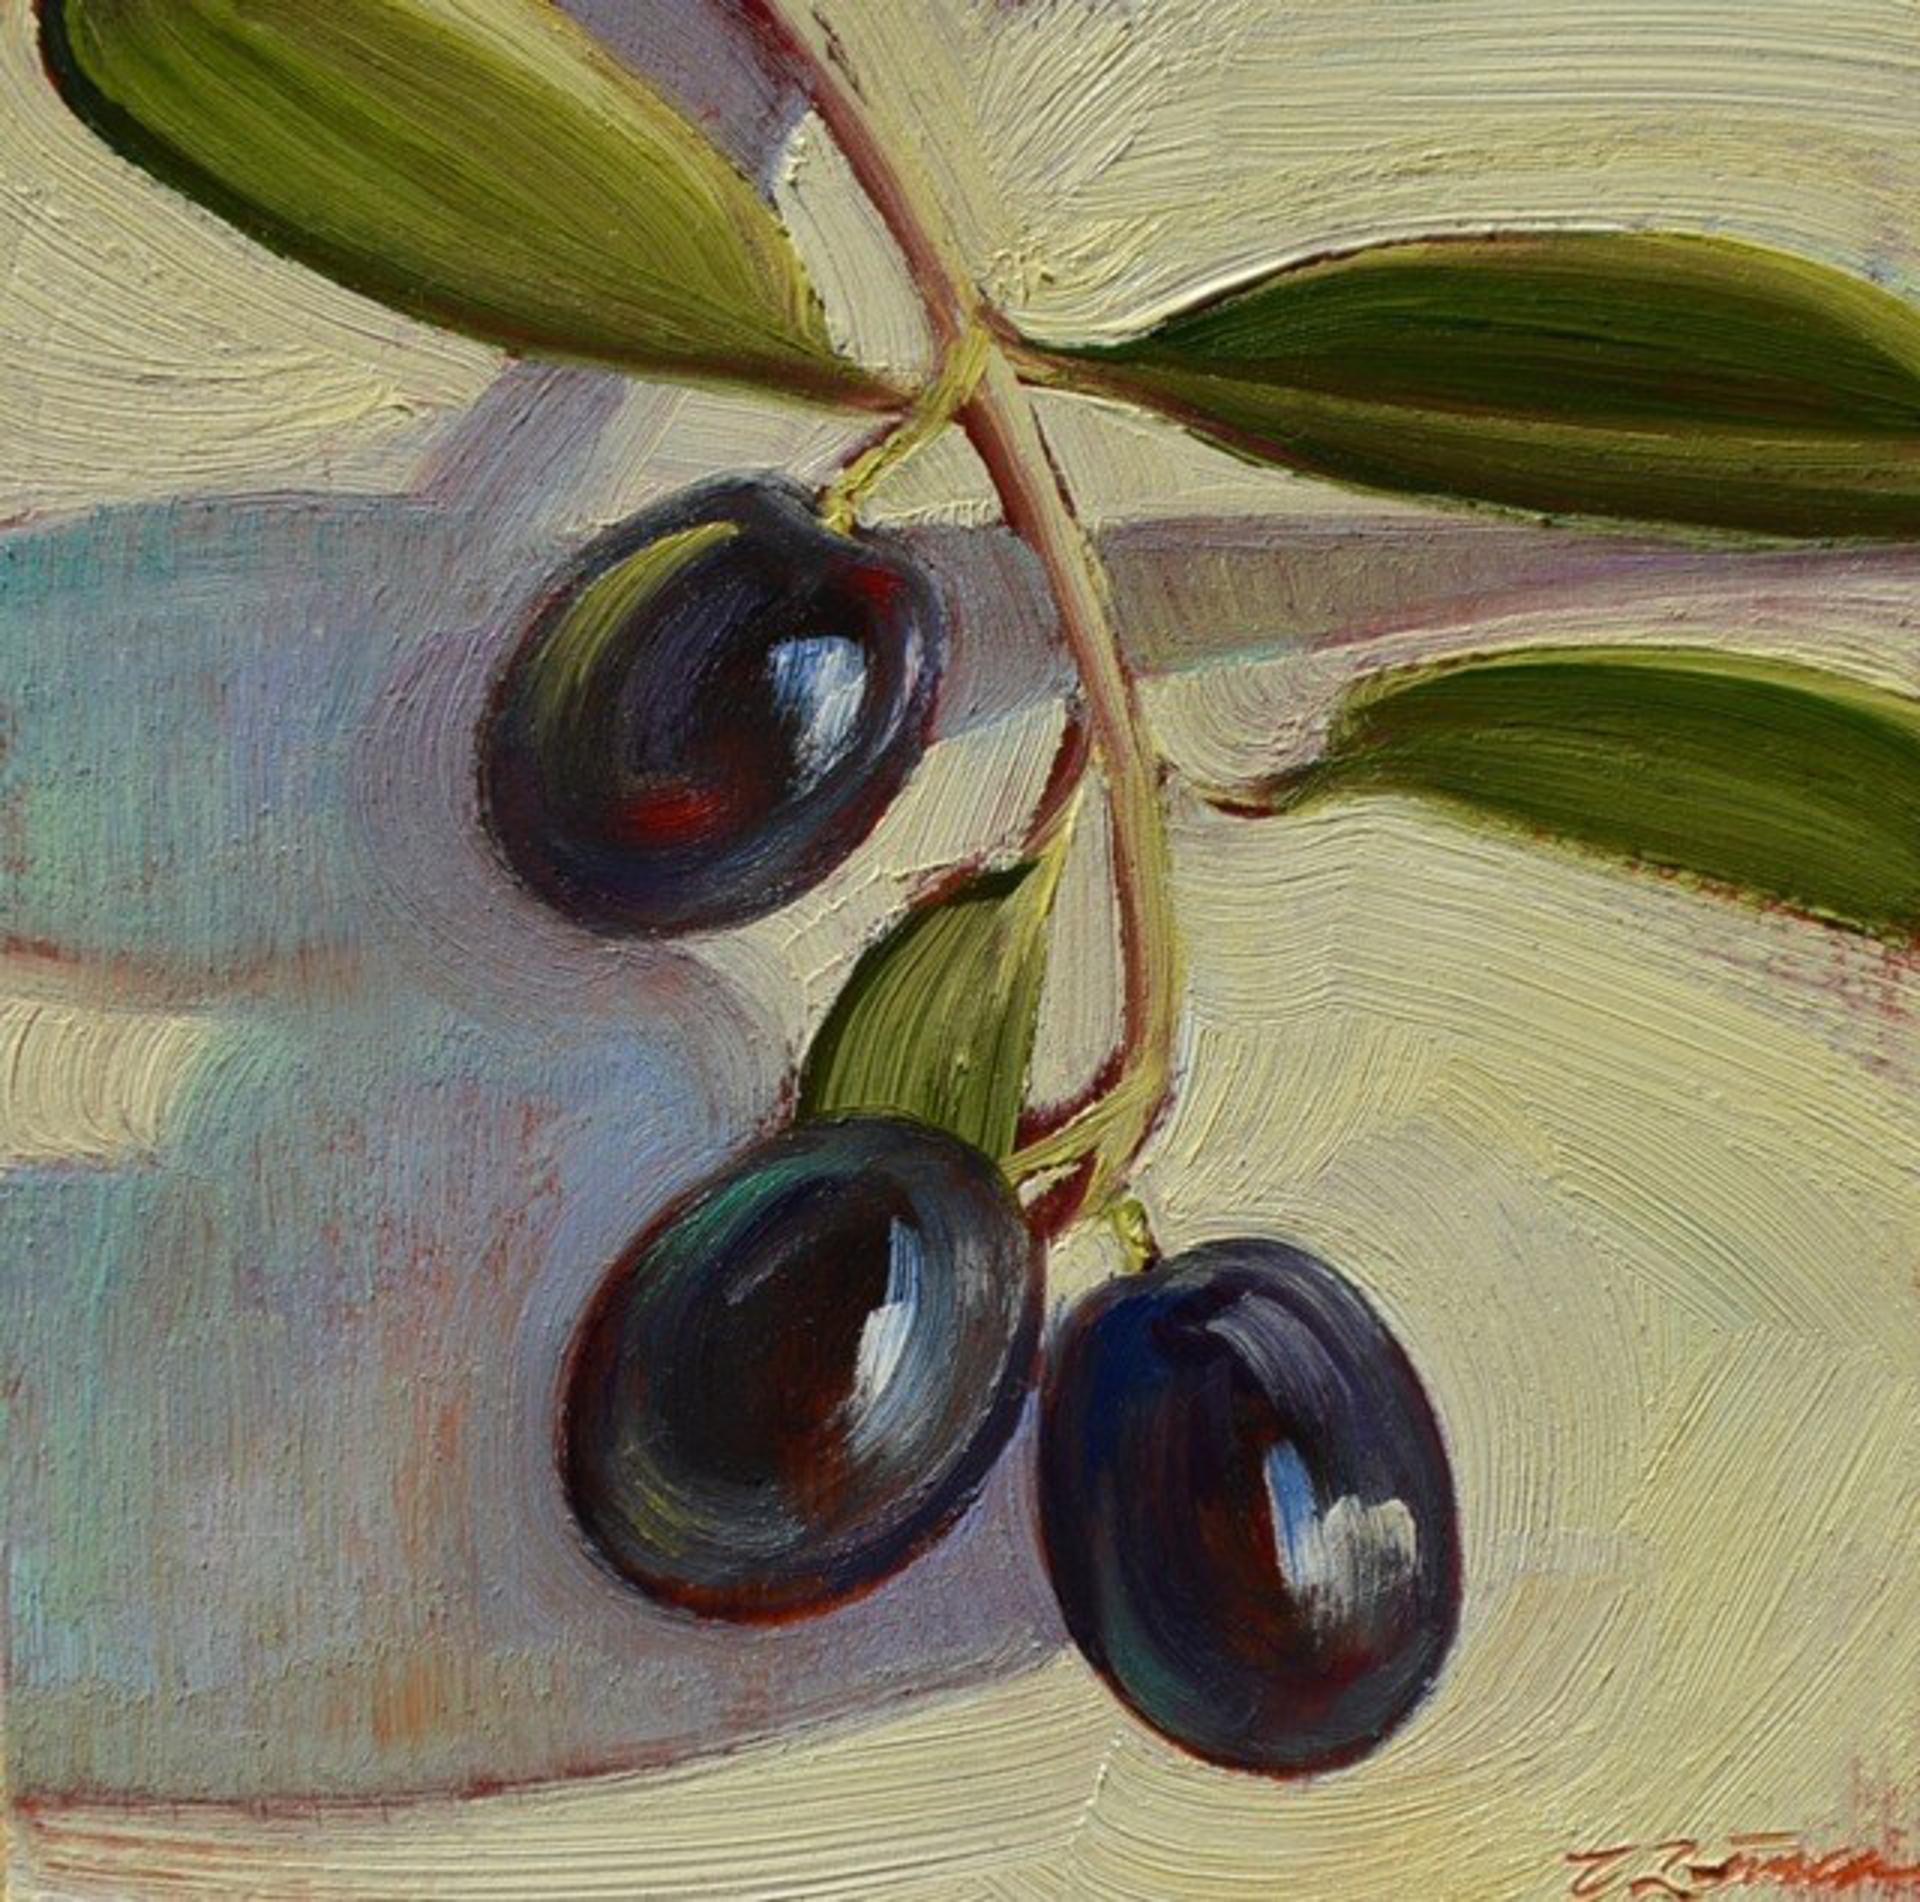 Tuscan Olives 1 by Caroline Zimmermann